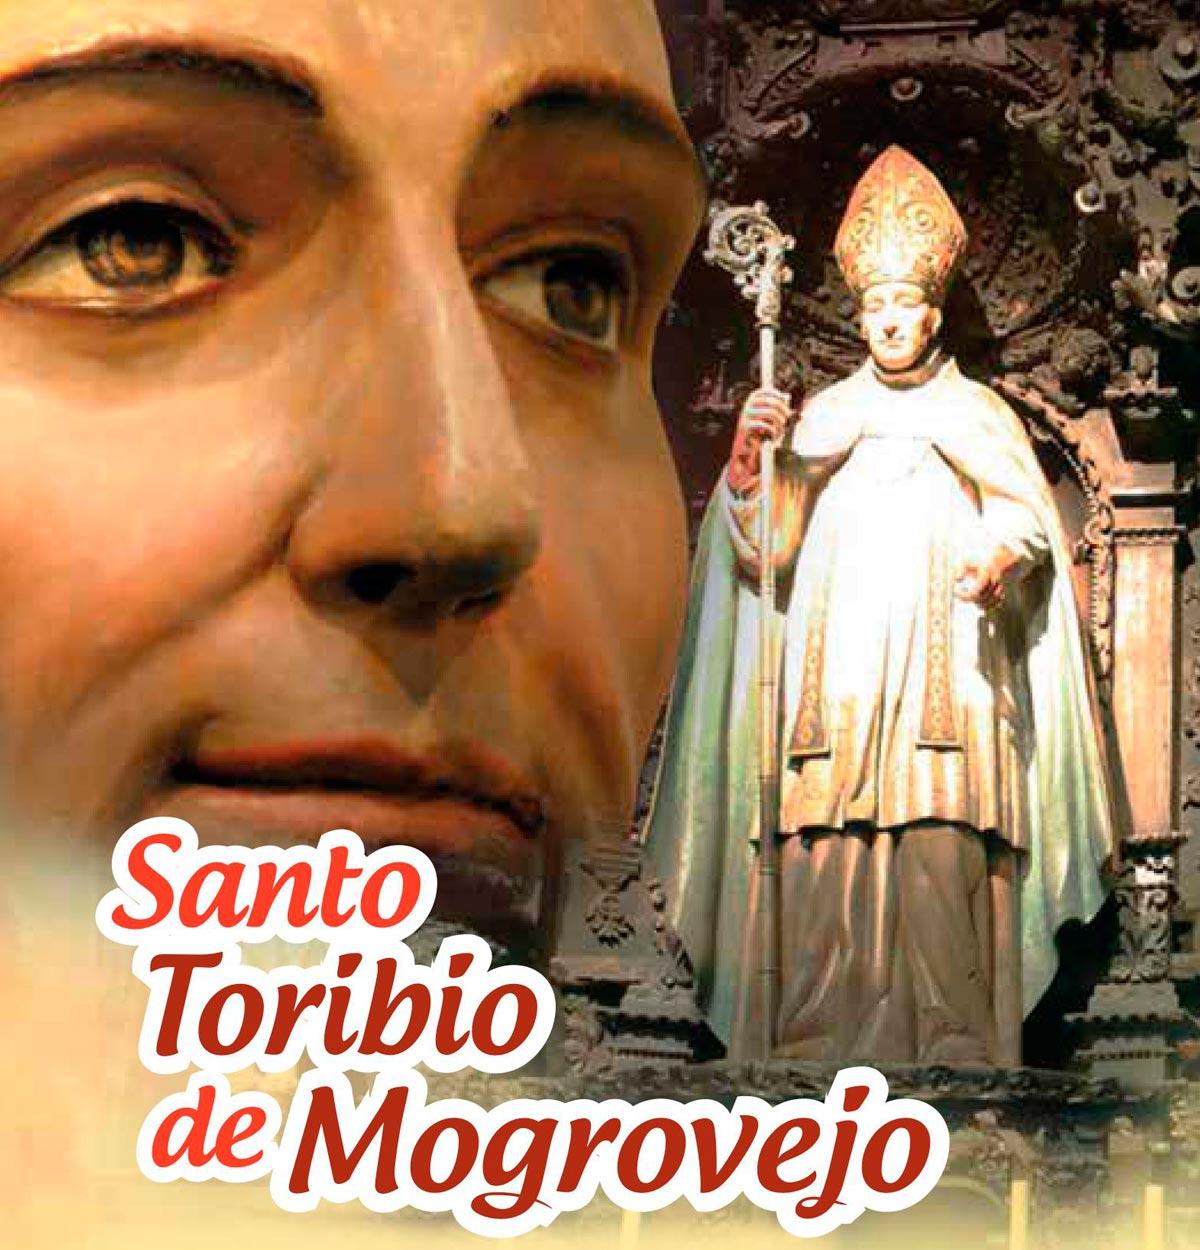 Santo de Toribio Mogrovejo